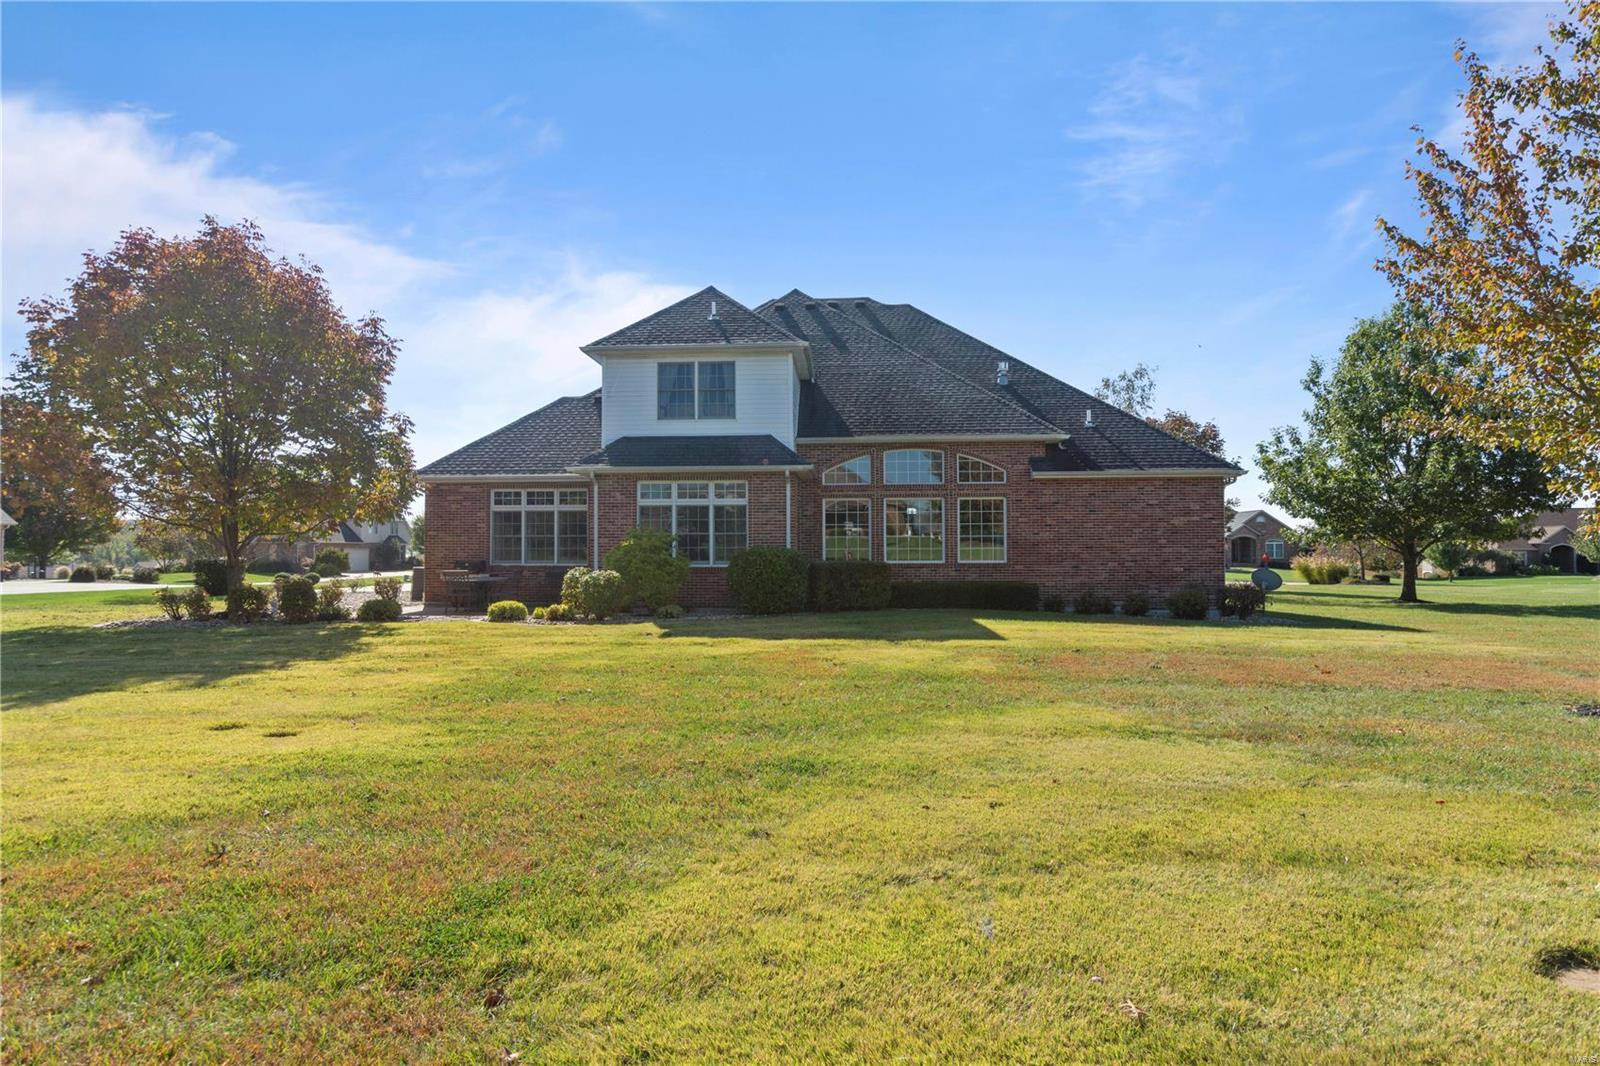 563 LaCroix Property Photo - Columbia, IL real estate listing